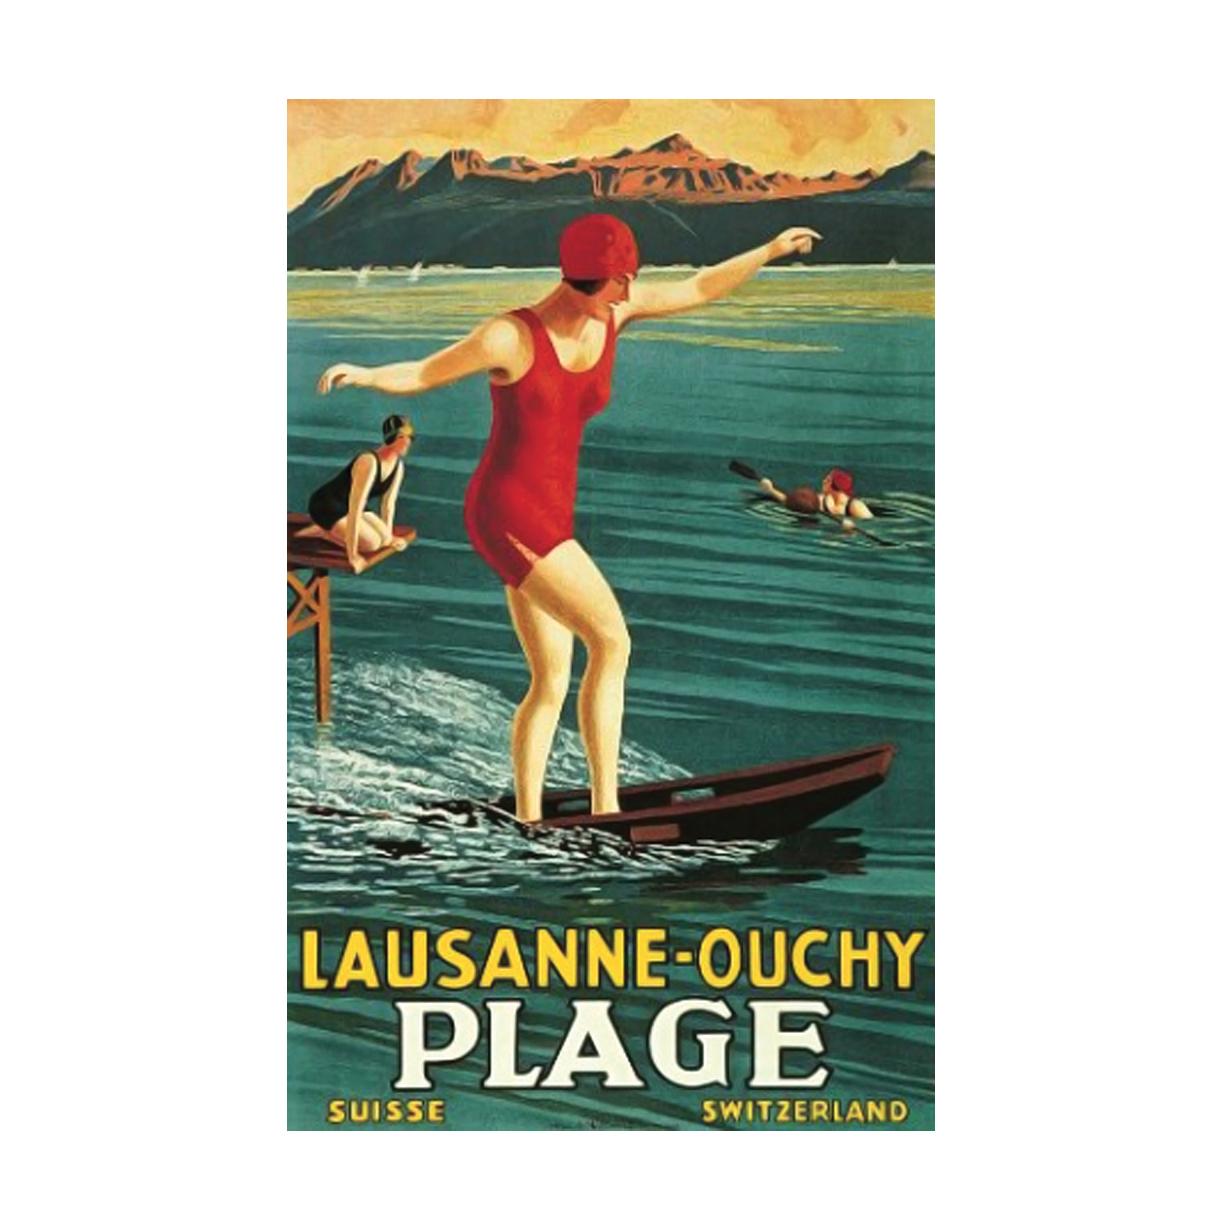 Salle De Bain Bicarbonate Vinaigre ~ Poster Vintage Lausanne Ouchy Everydaydesign